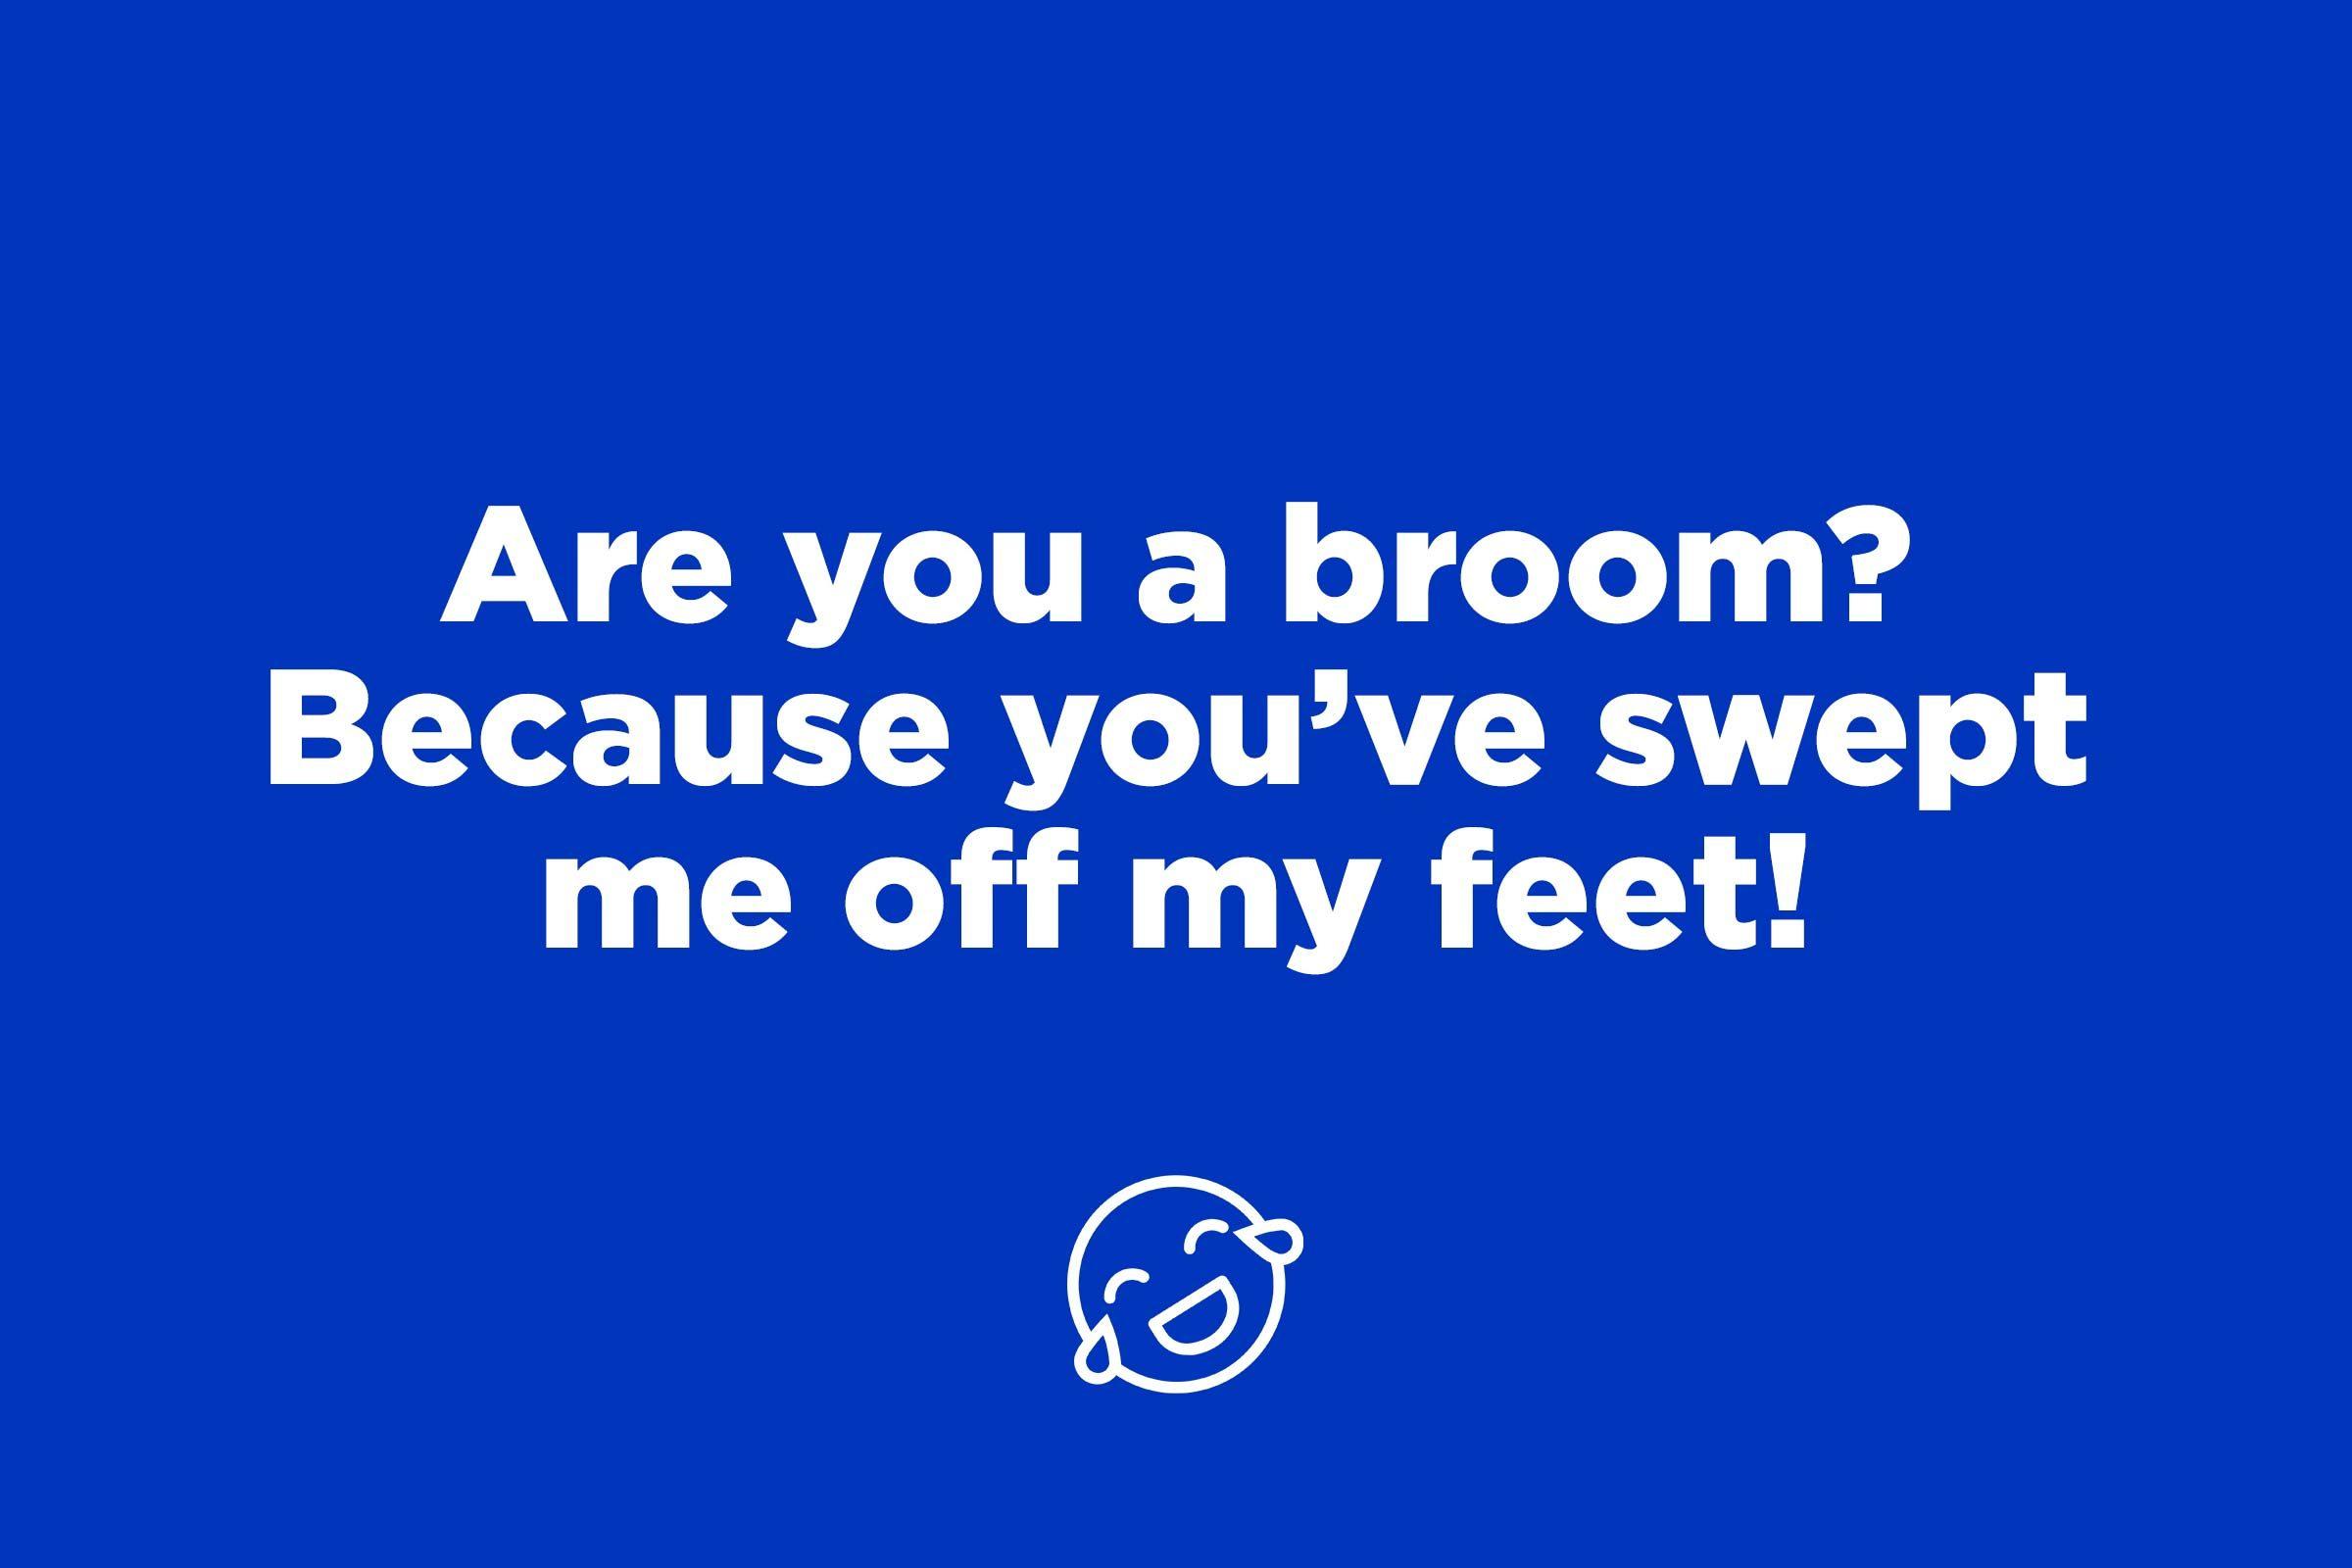 broom pick up line